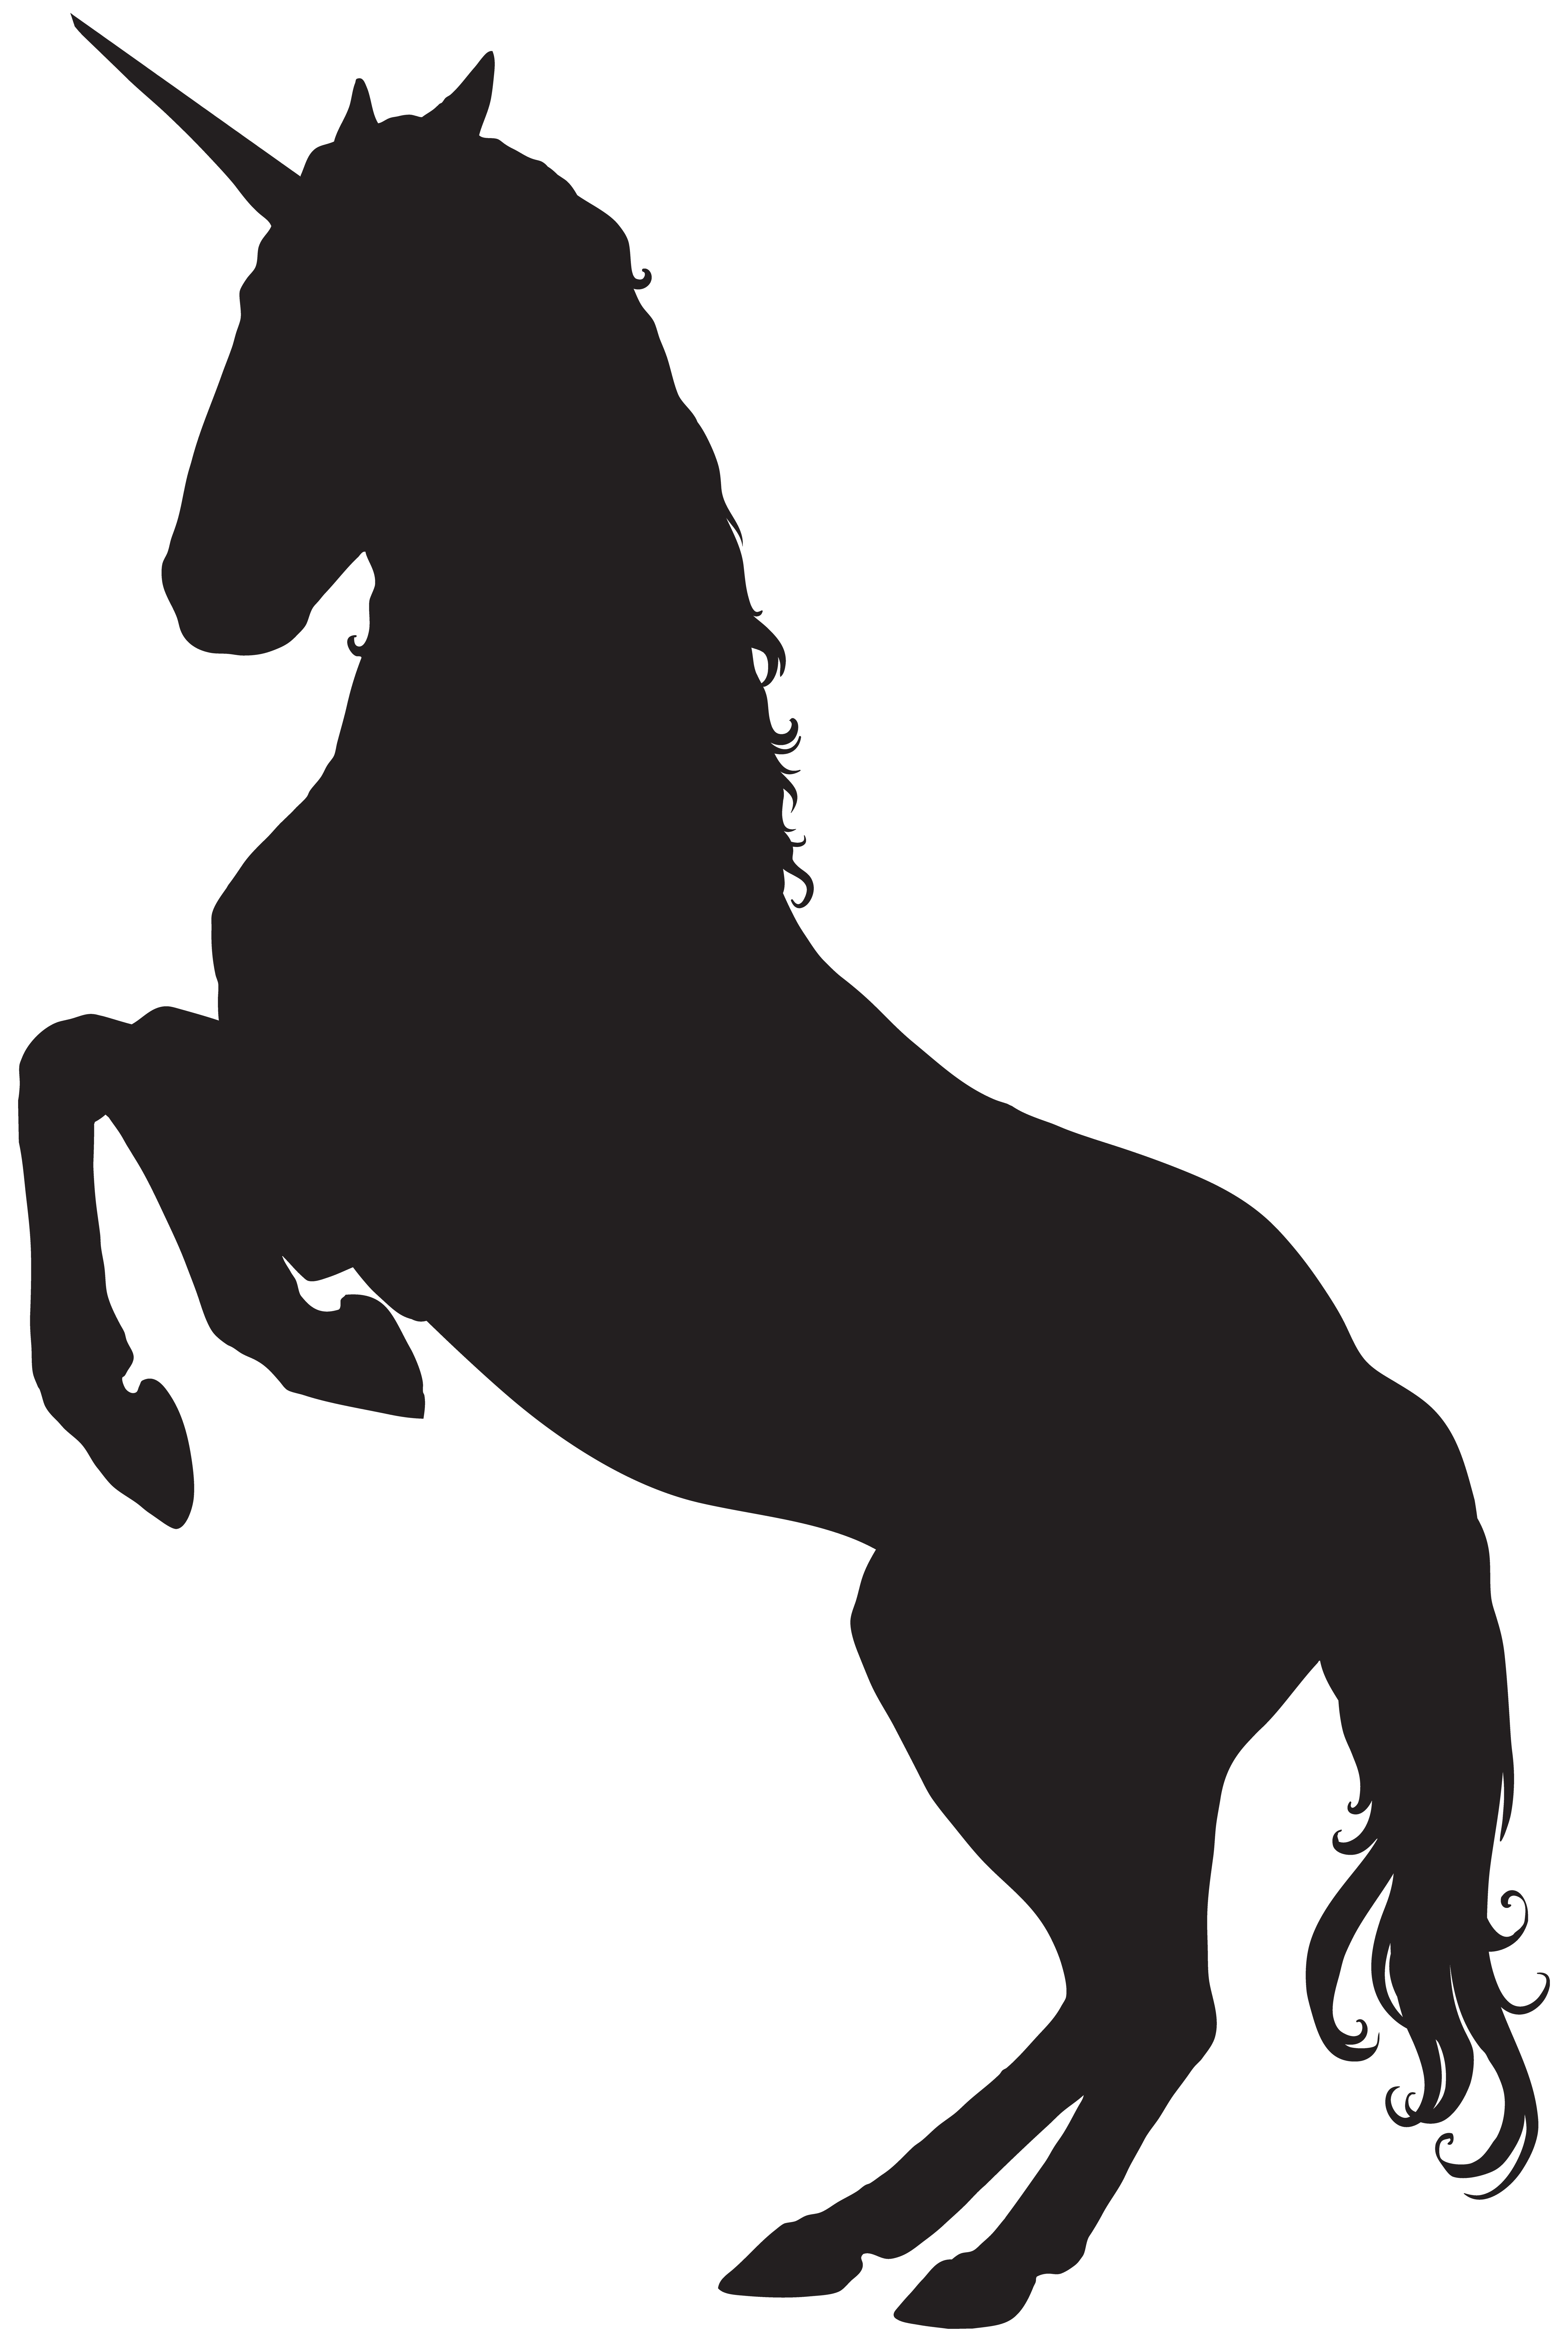 Png clip art image. Silhouette clipart unicorn